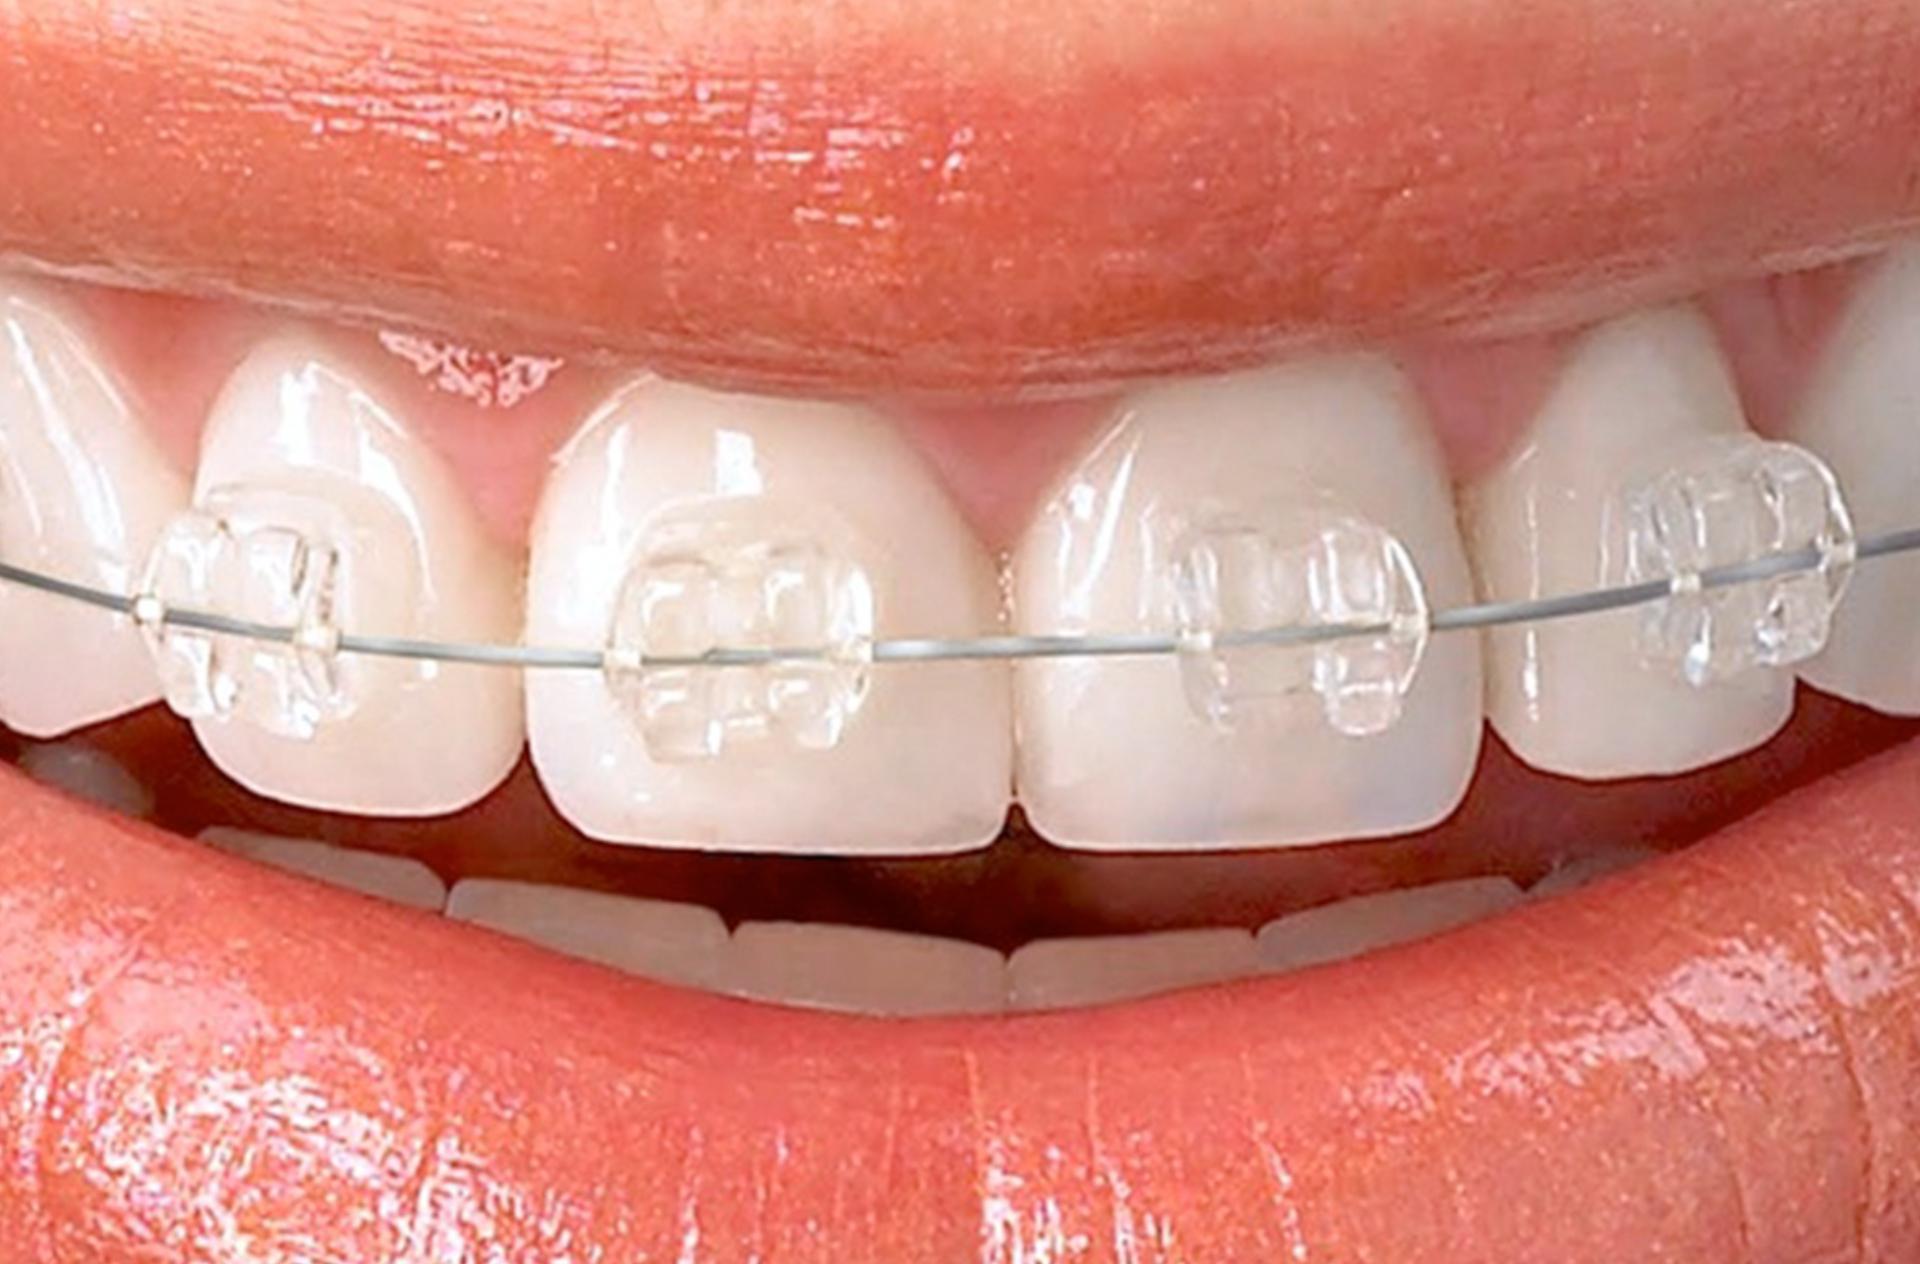 Fixed esthetic dental braces (one jaw)